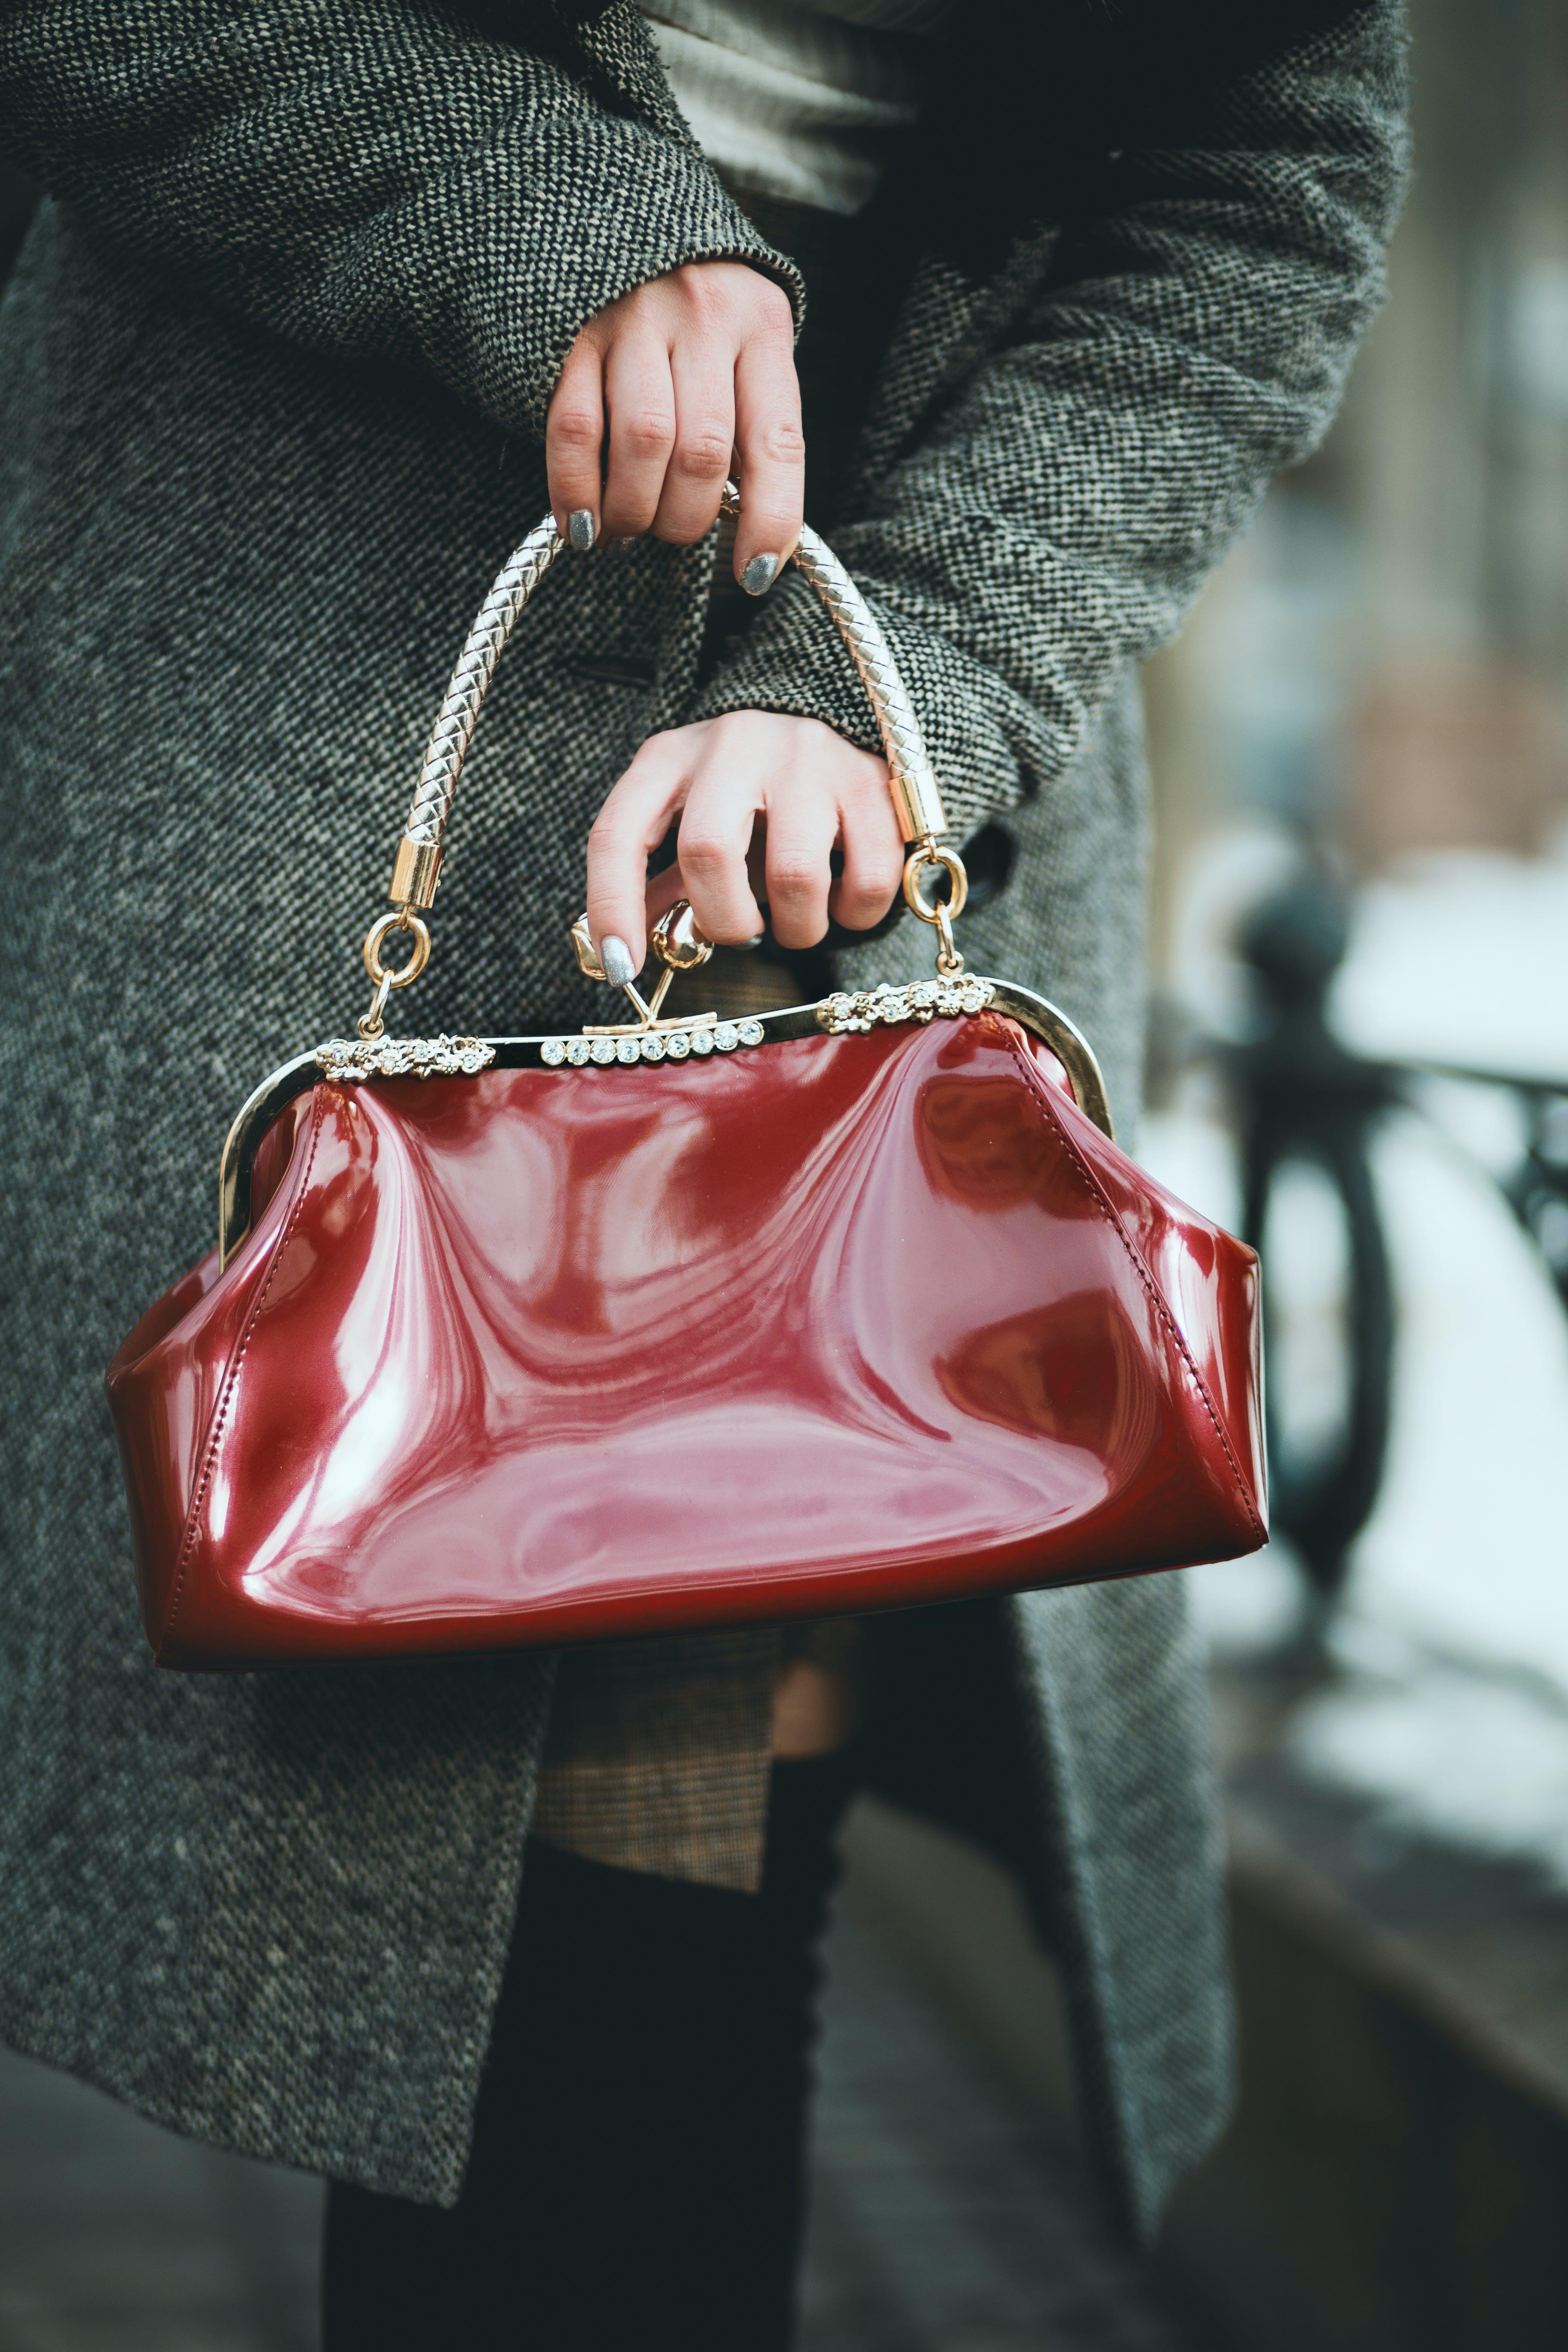 Woman Holding Red Handbag